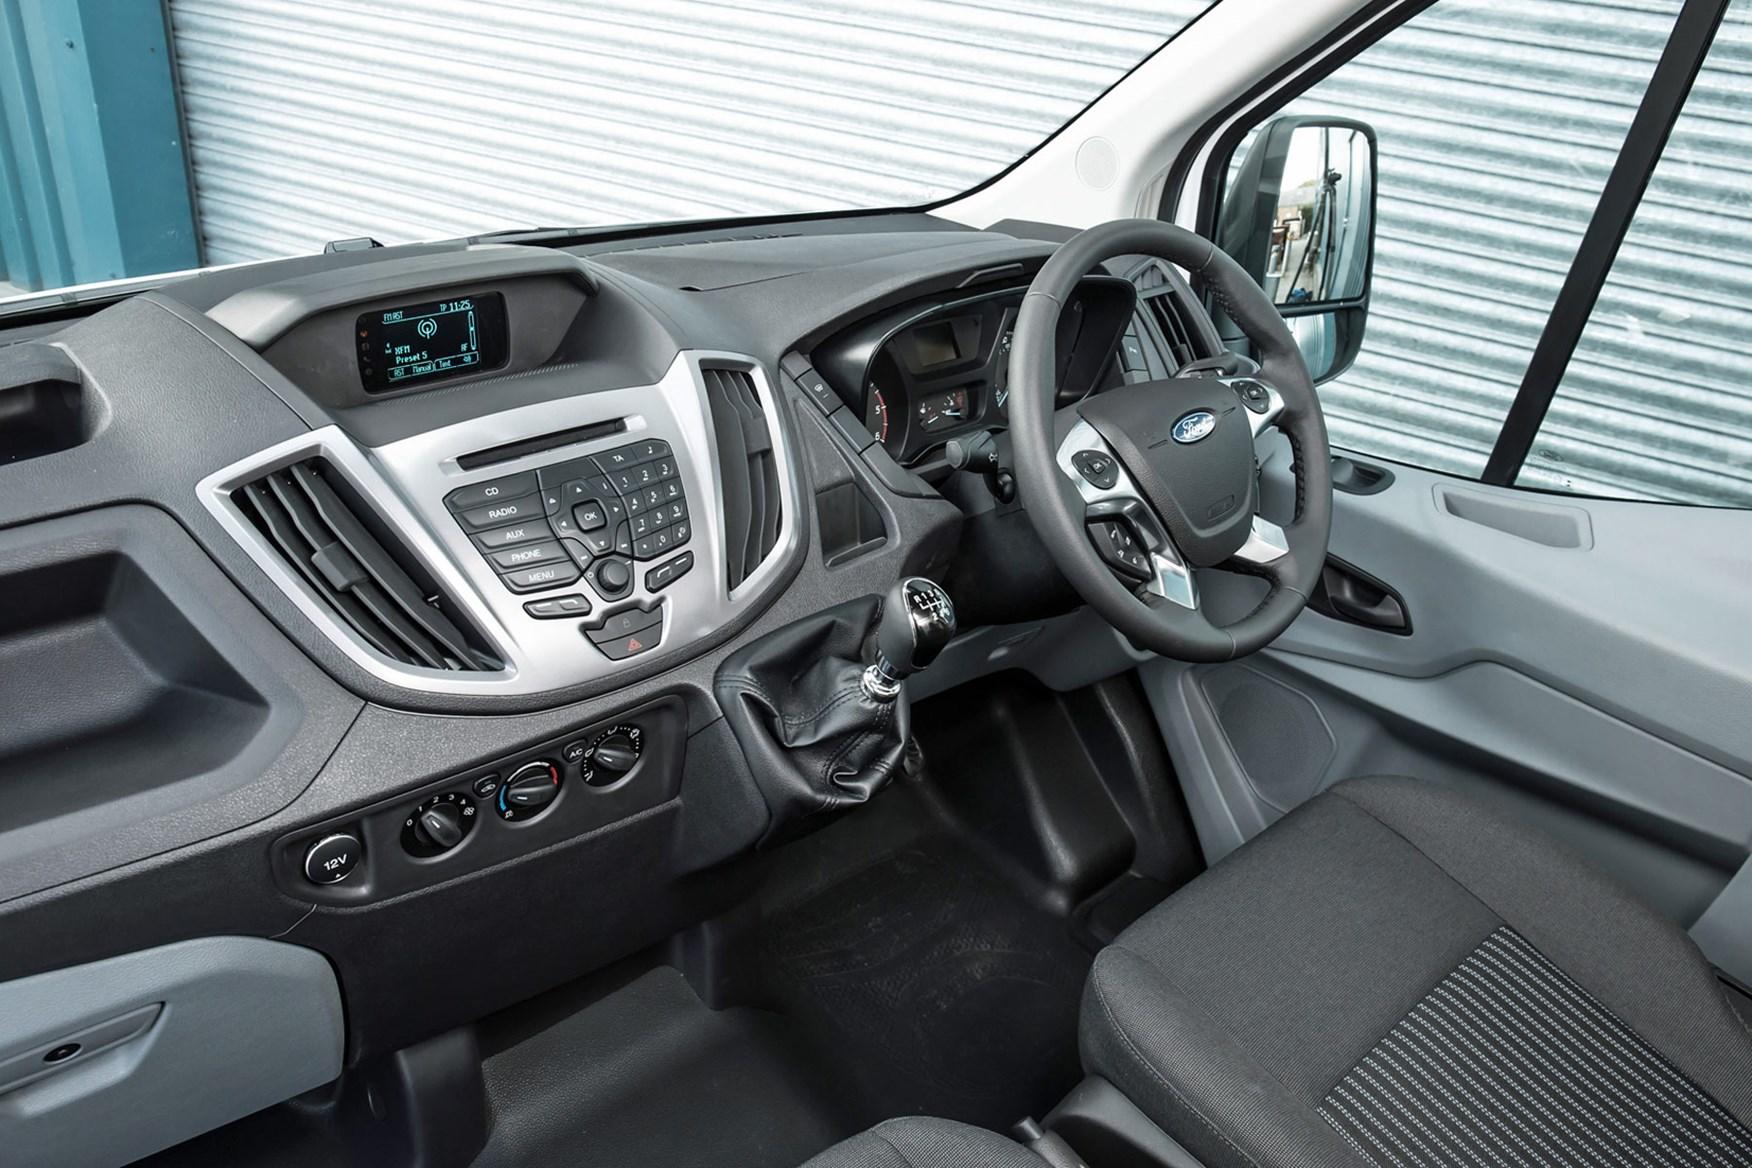 Ford Transit (2014-on) cab interior